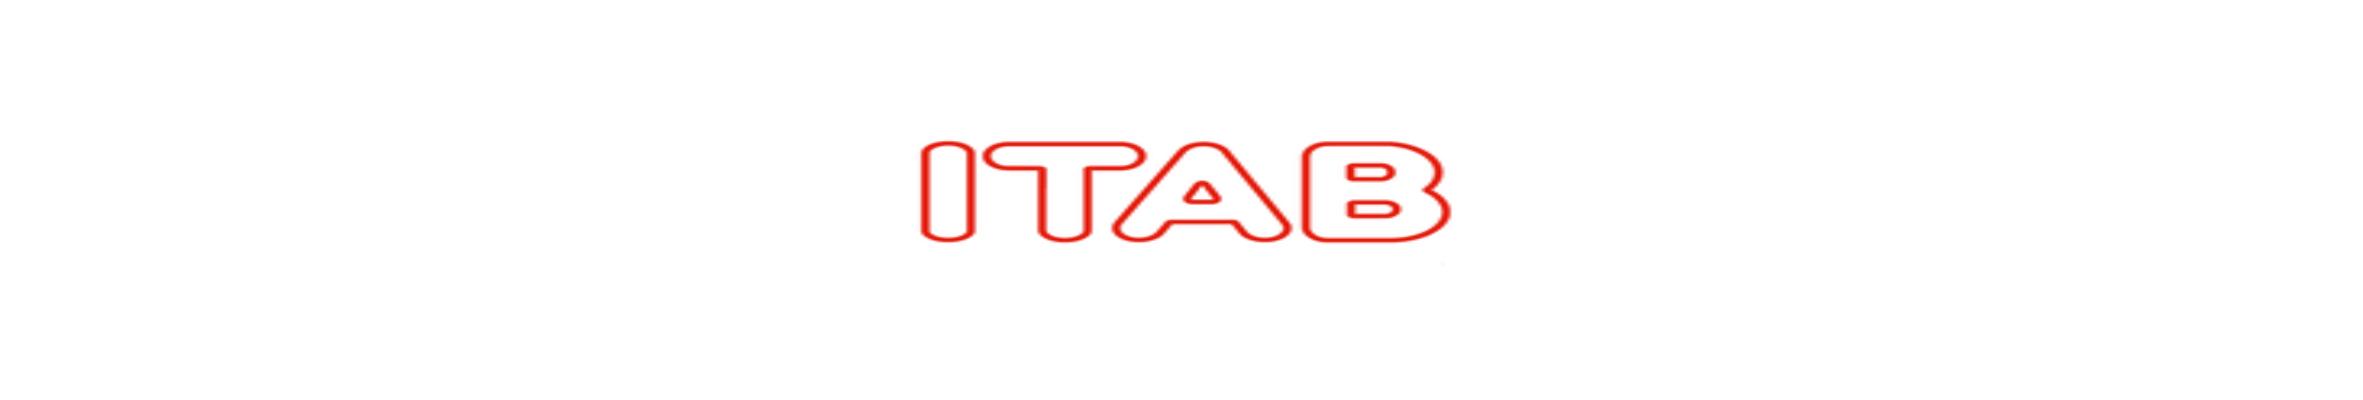 Langwerpig logo van ITAB Shop Concept